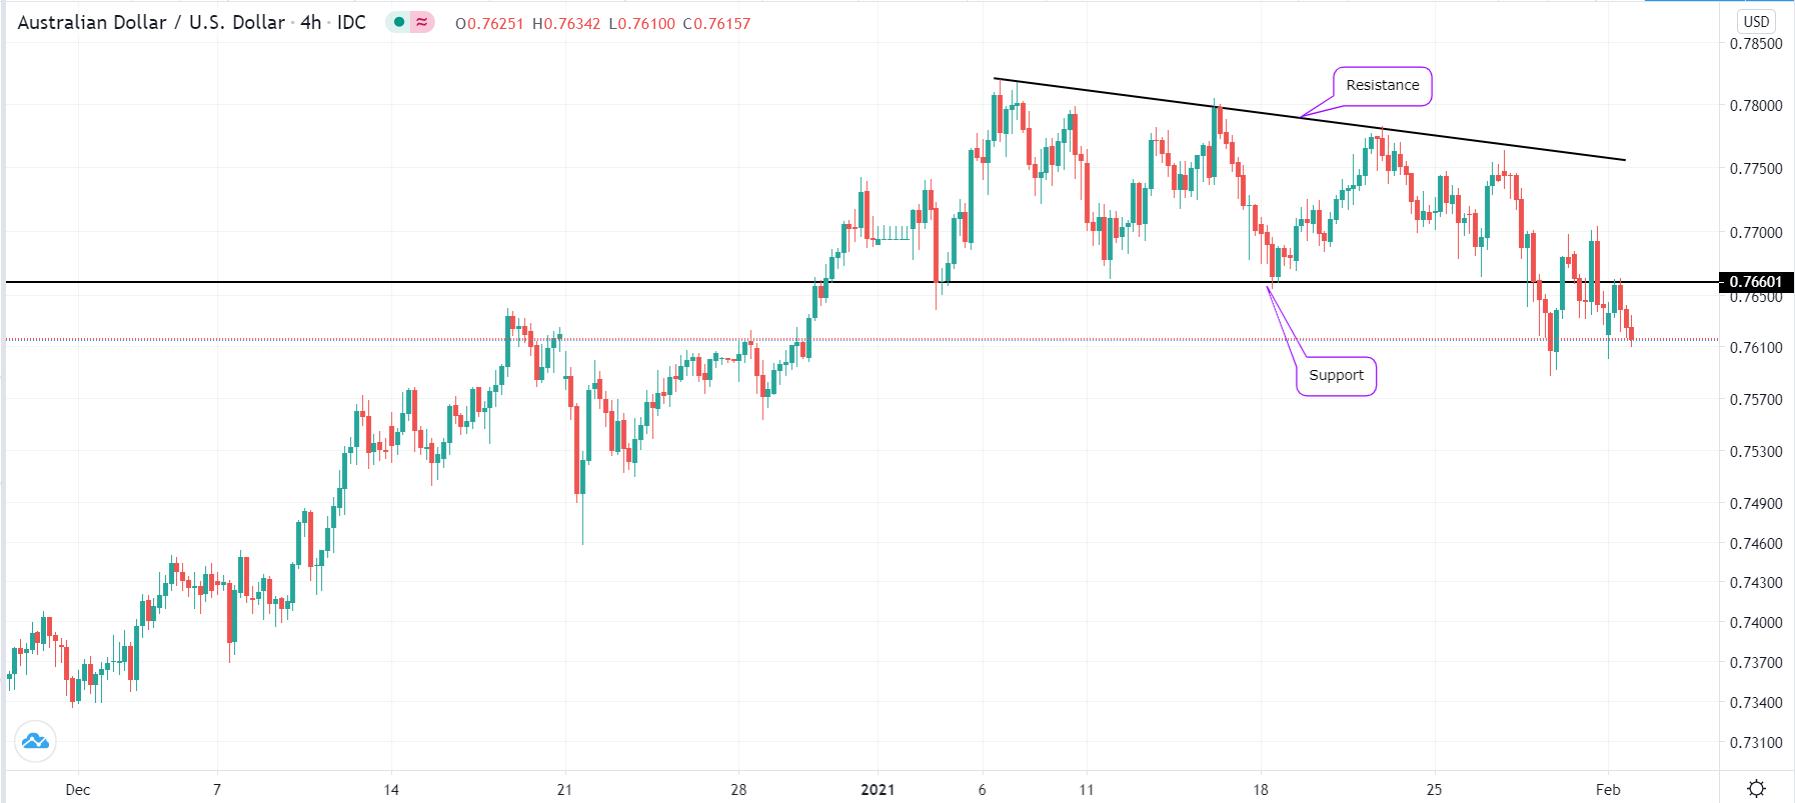 Range-bound market example